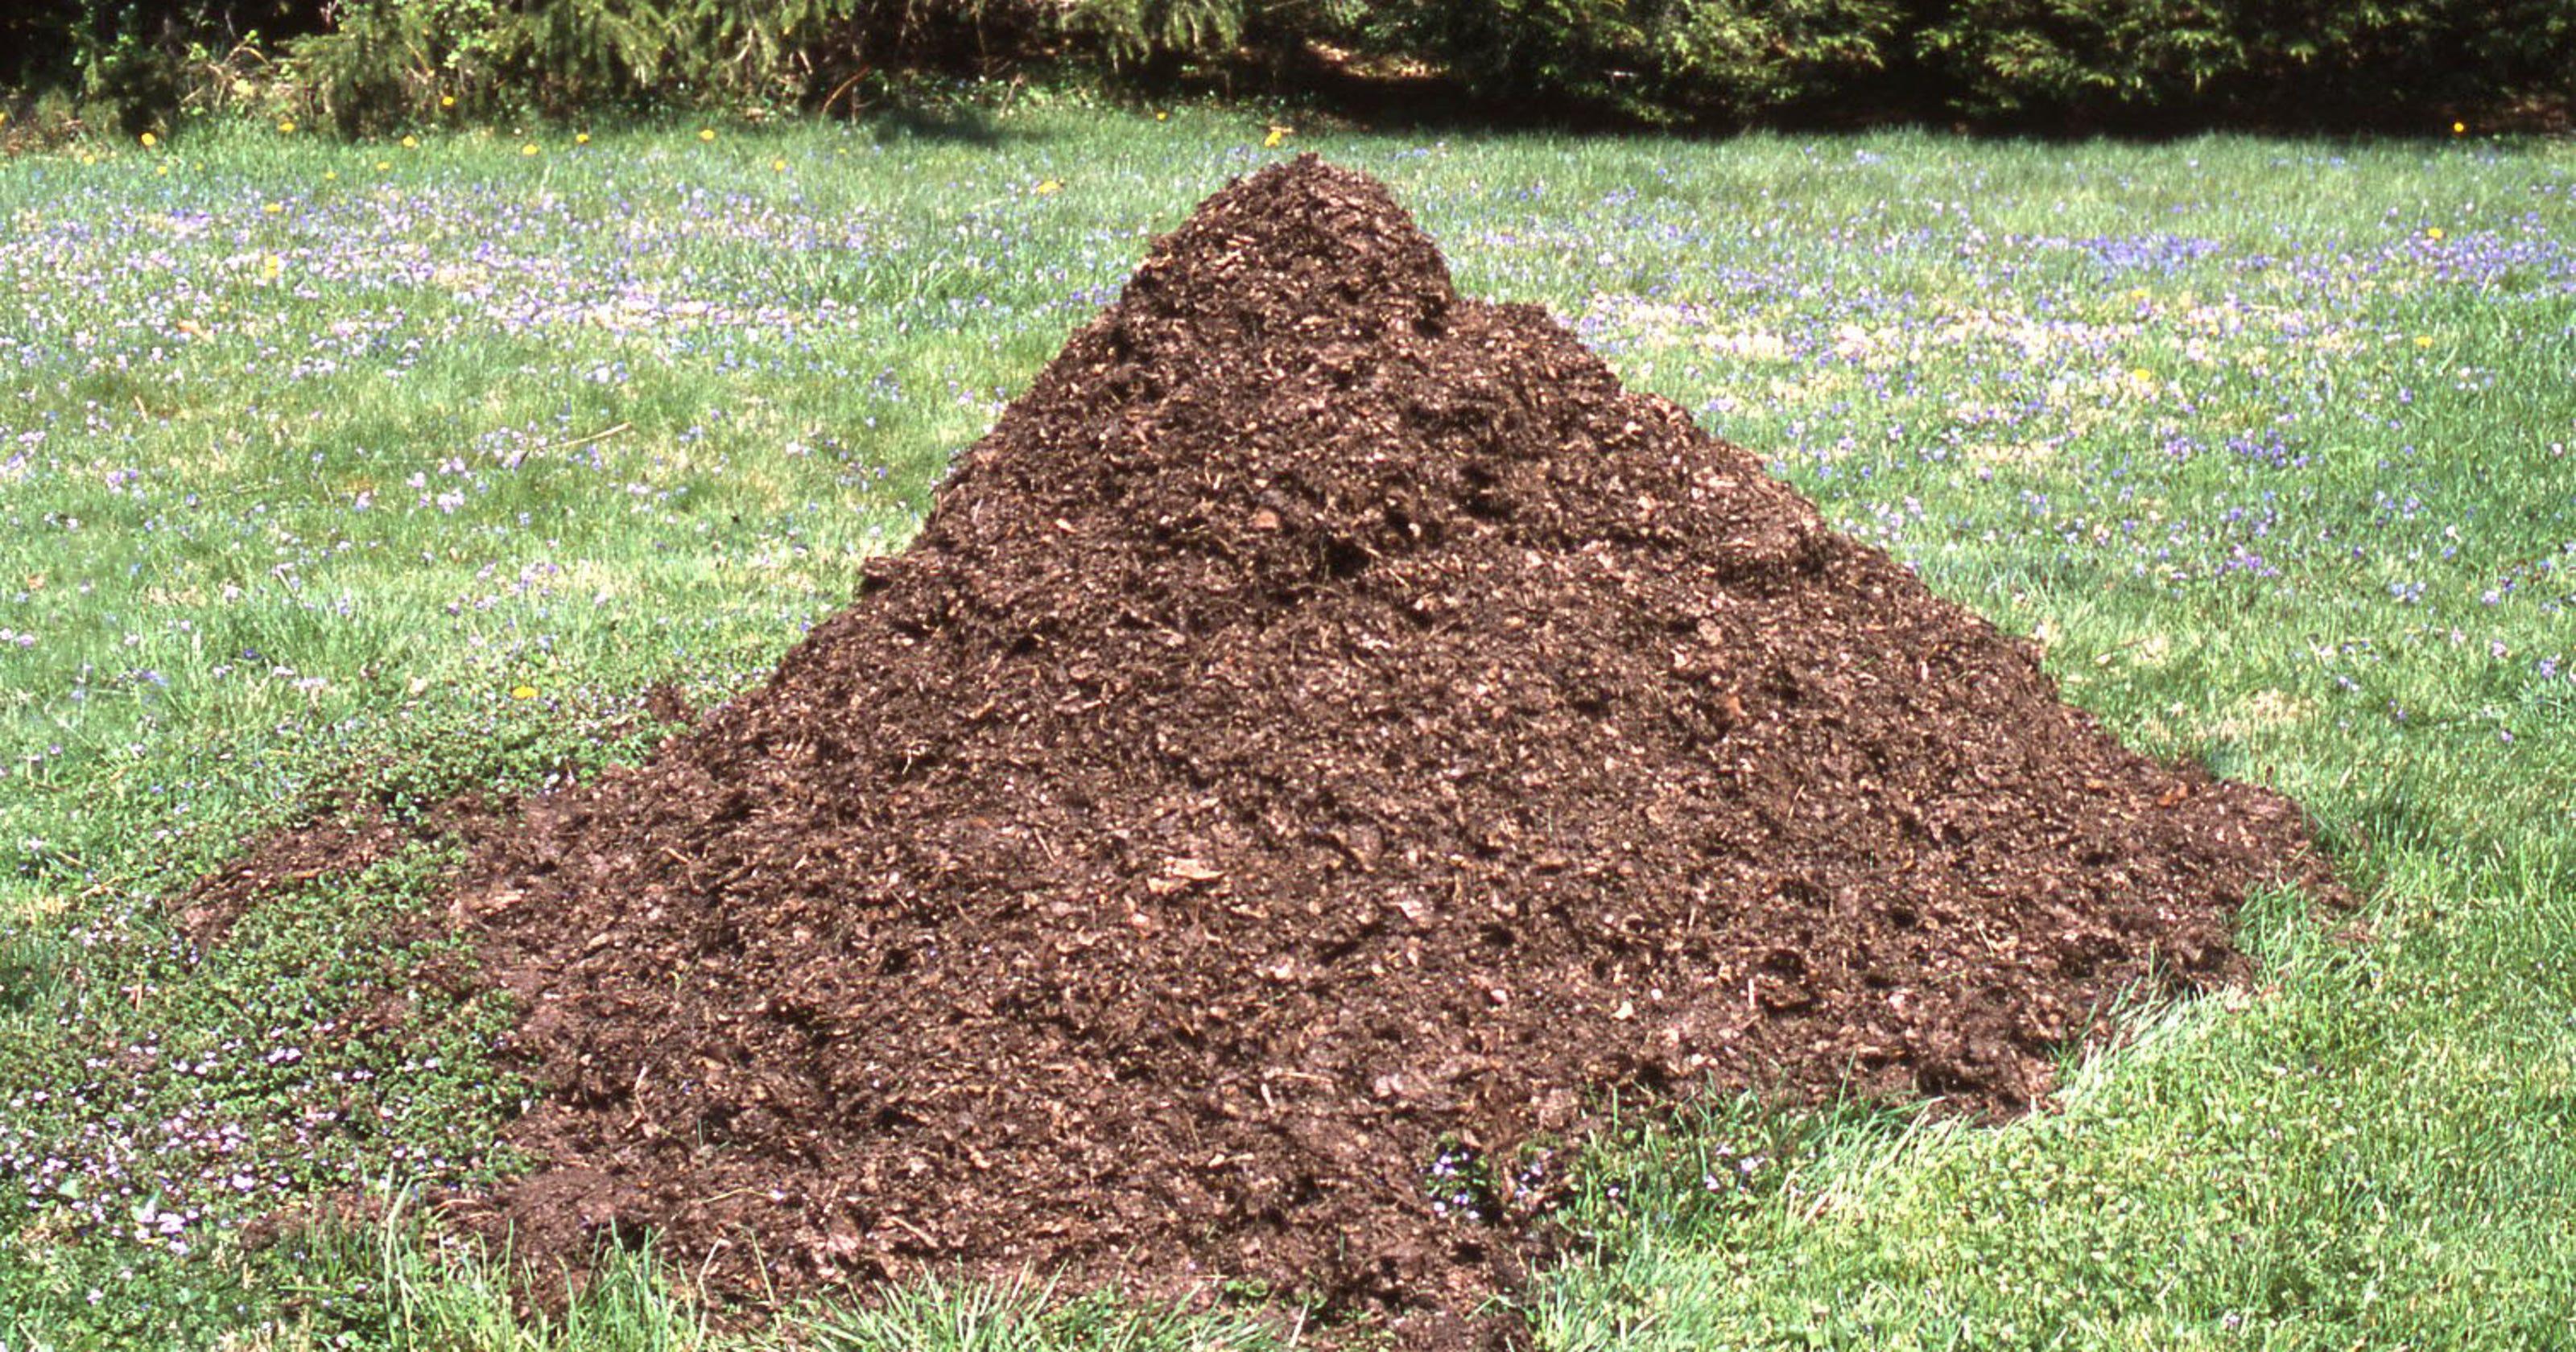 In The Garden   A good garden starts with good soil